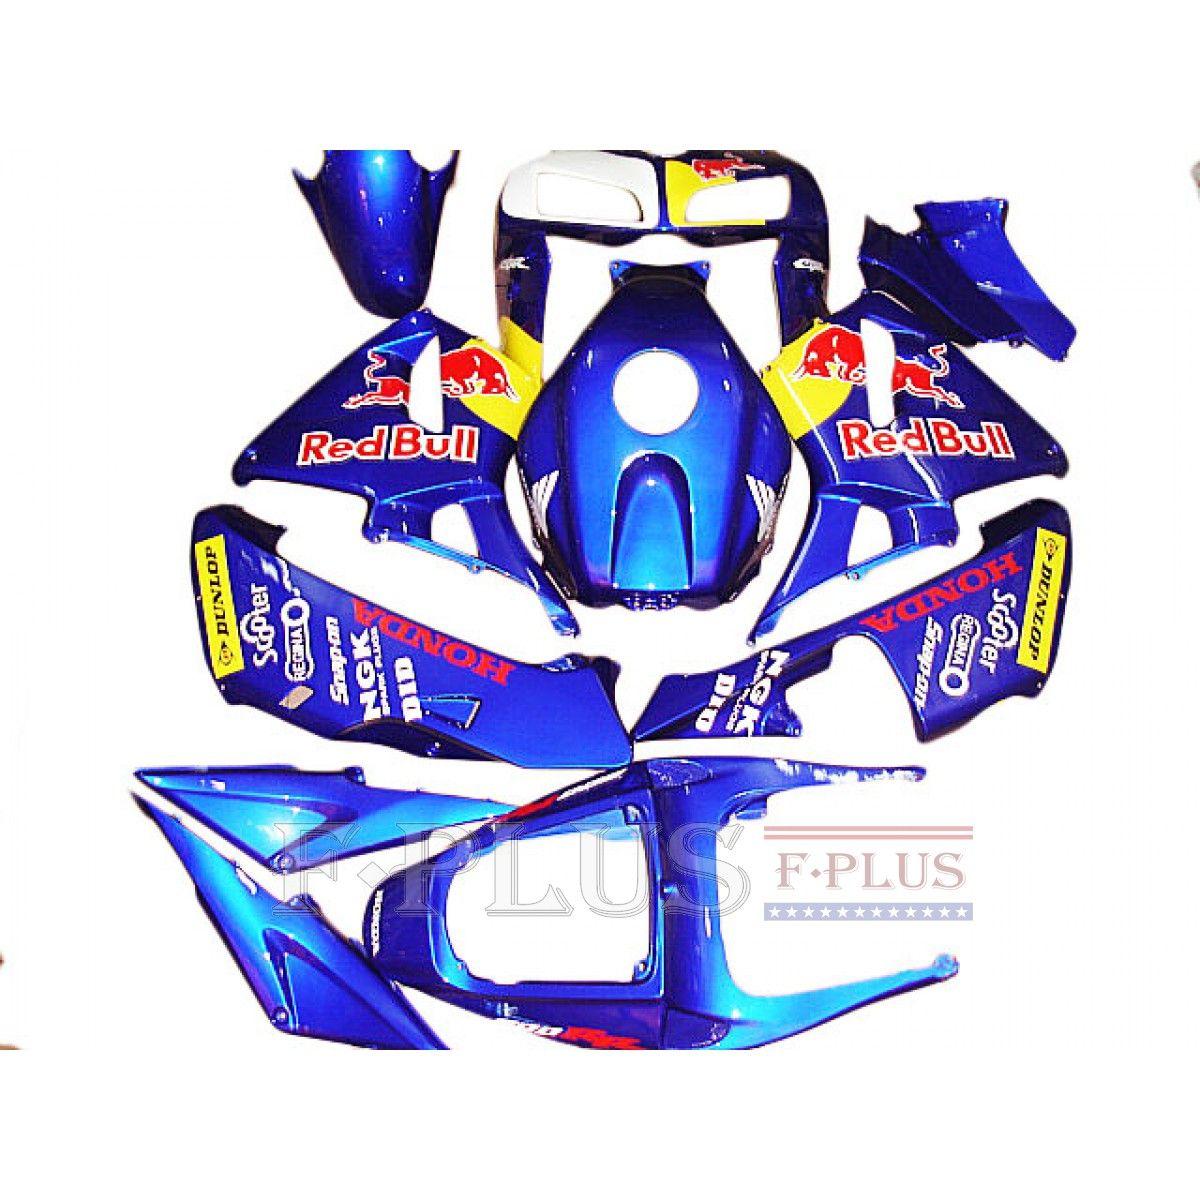 Aftermarket Fairings For Honda Cbr600rr 05 06 Red Bull Abs Kits 2005